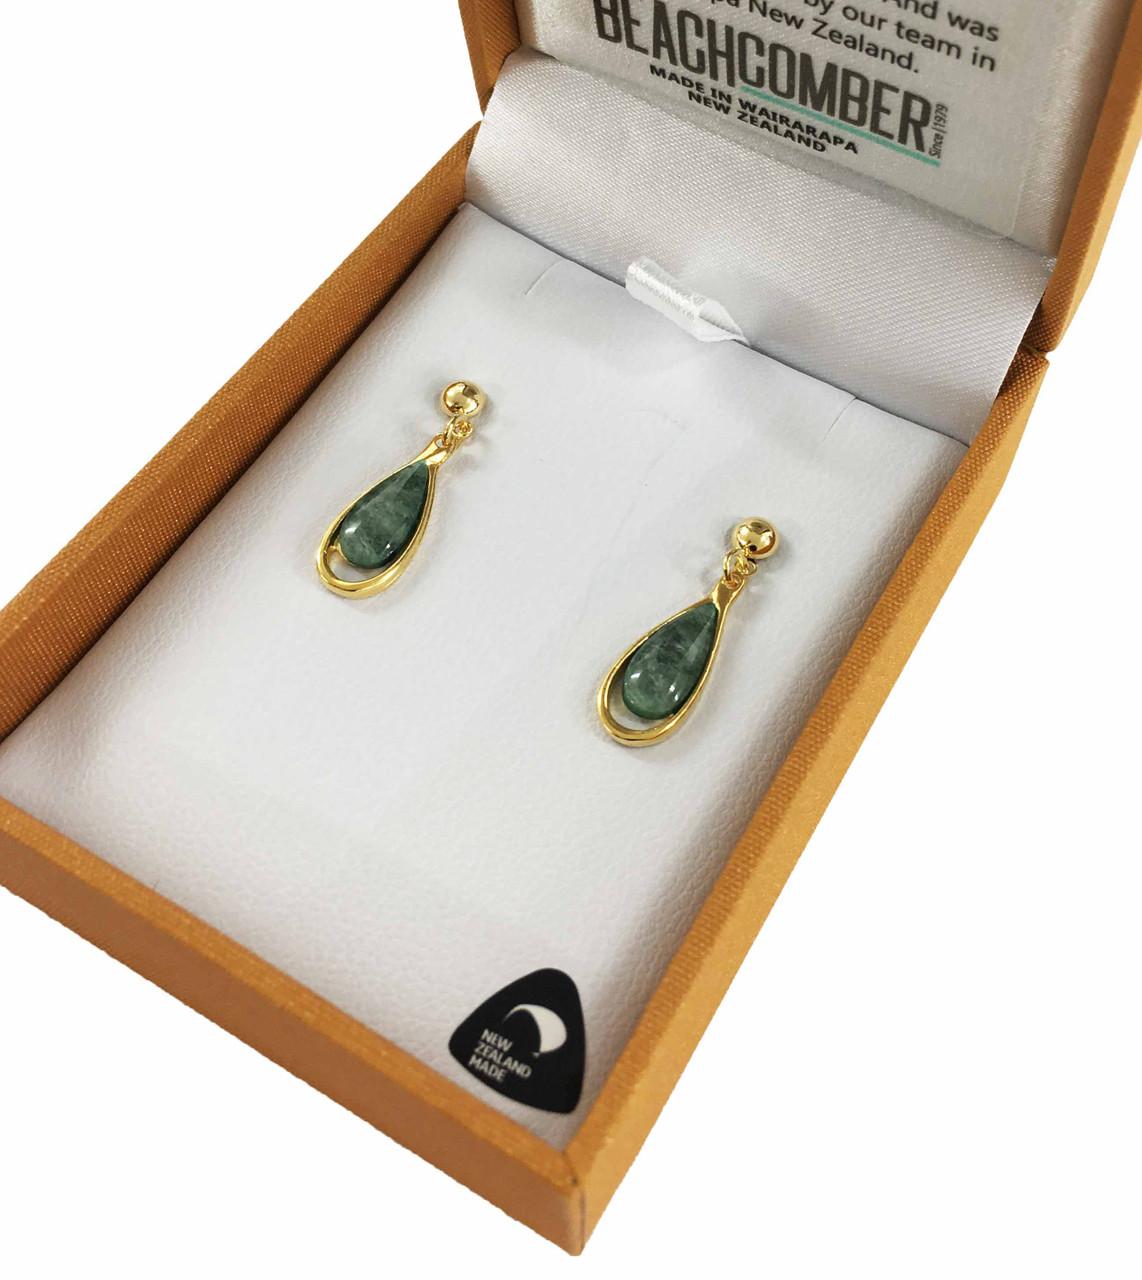 BBJ4137E NZ Pounamu Earrings Set in 22ct Gold Plated